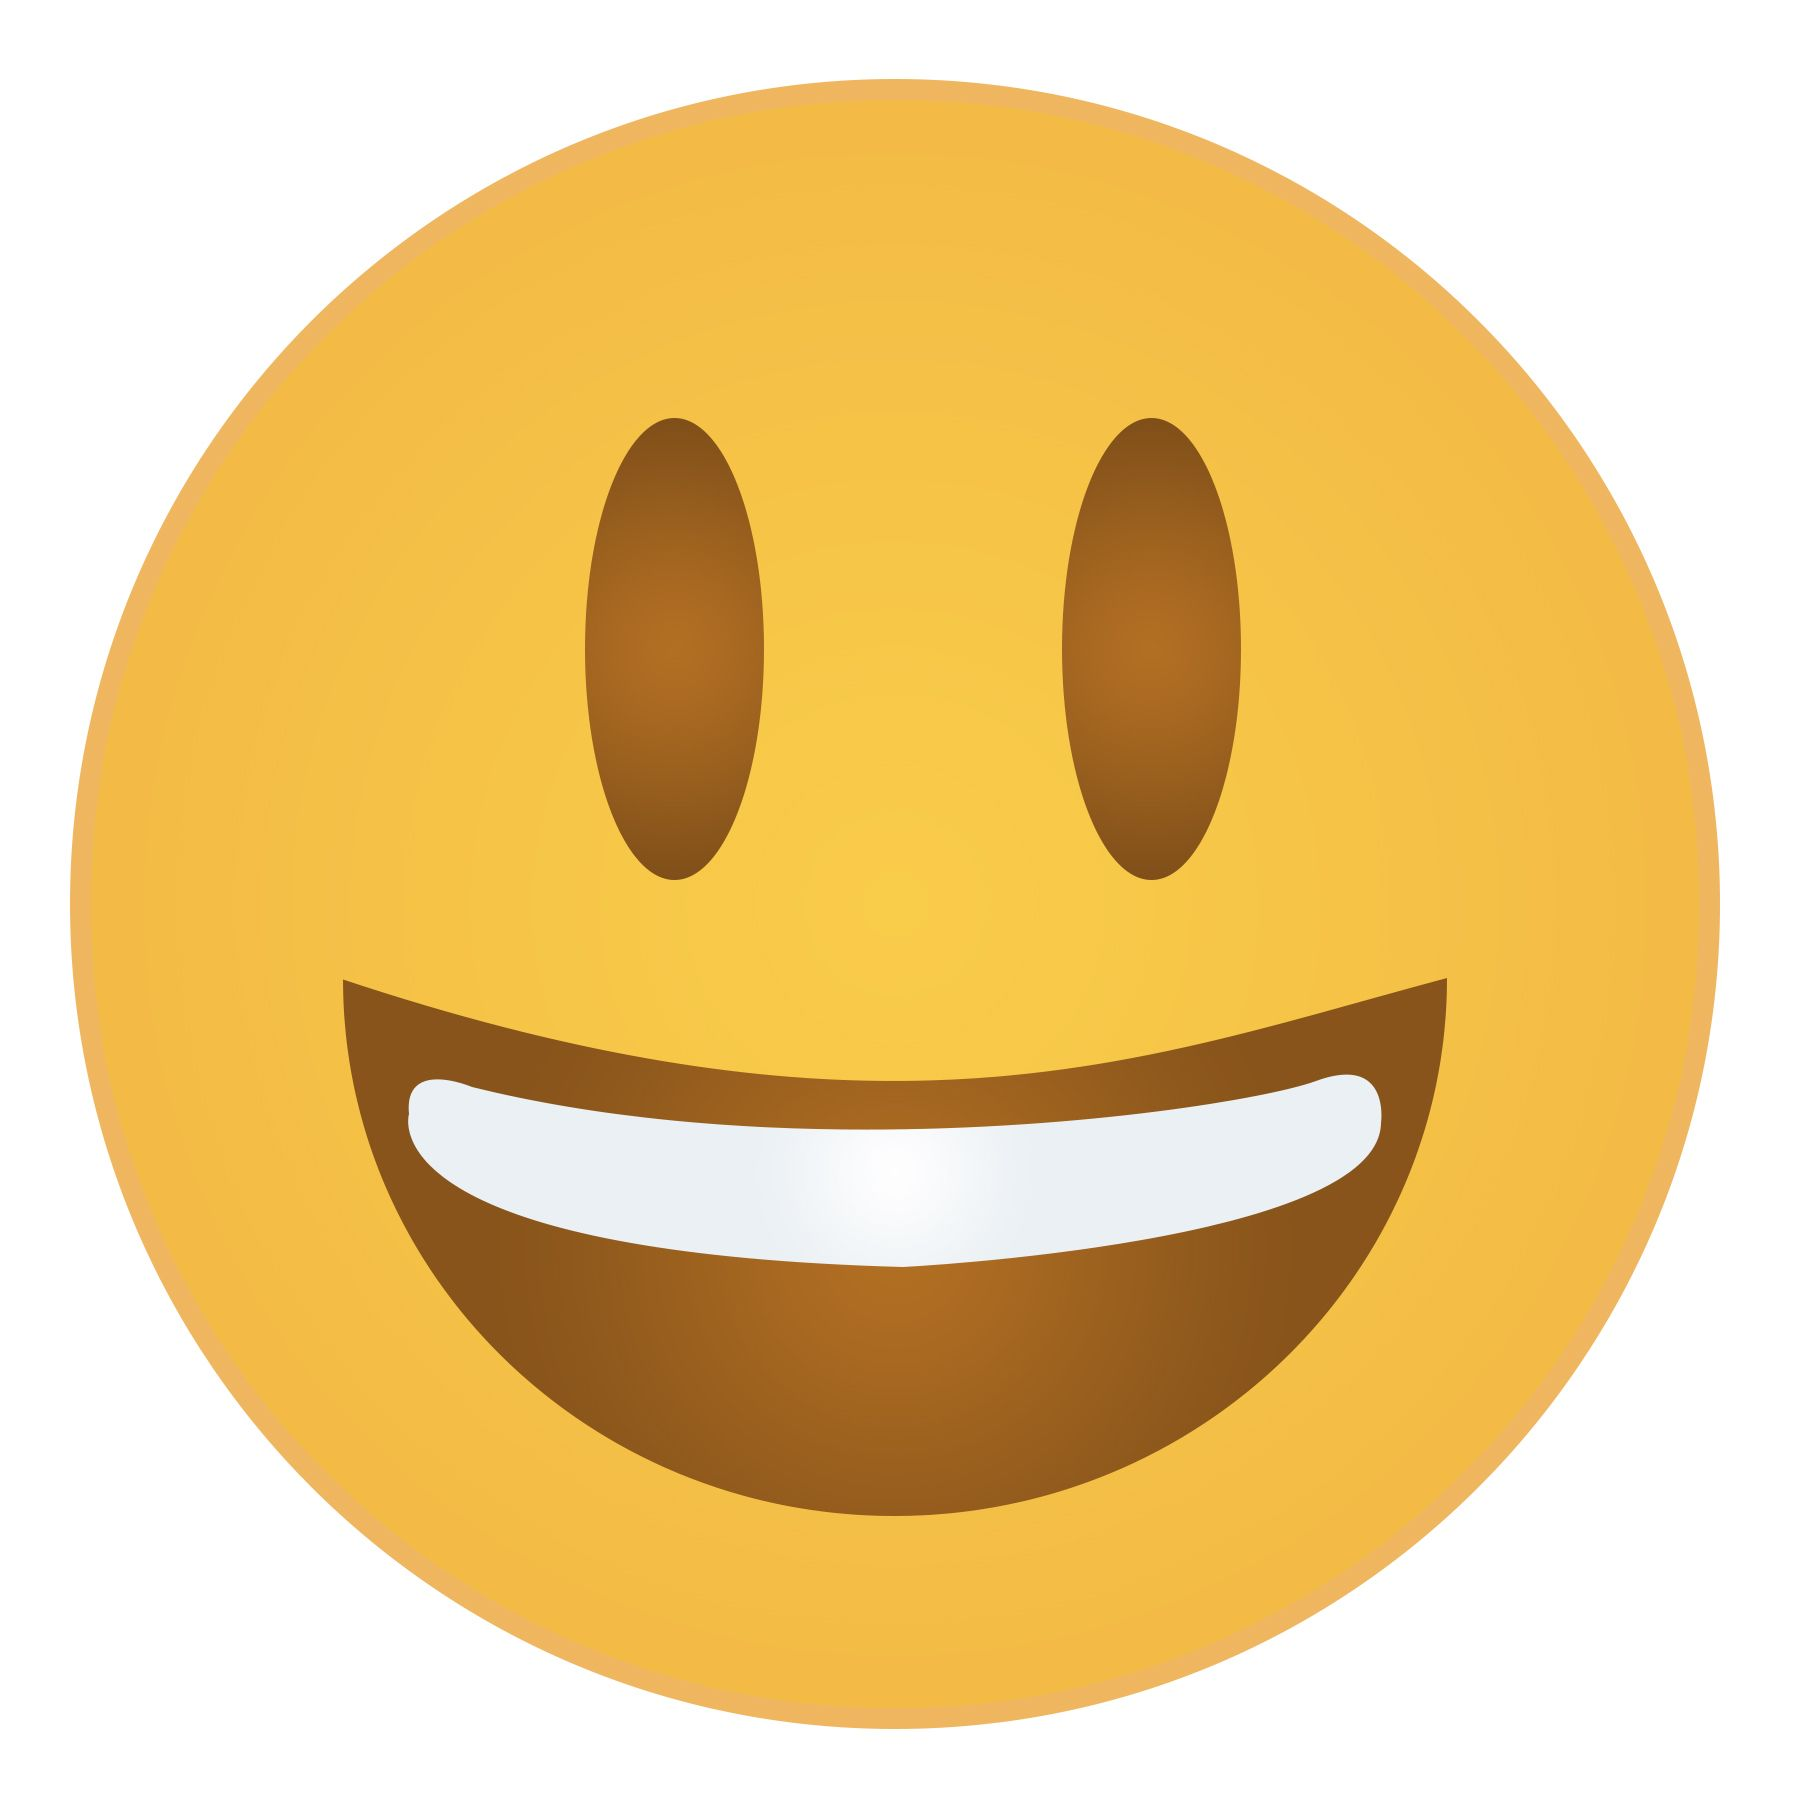 Free Printable Emoji Faces